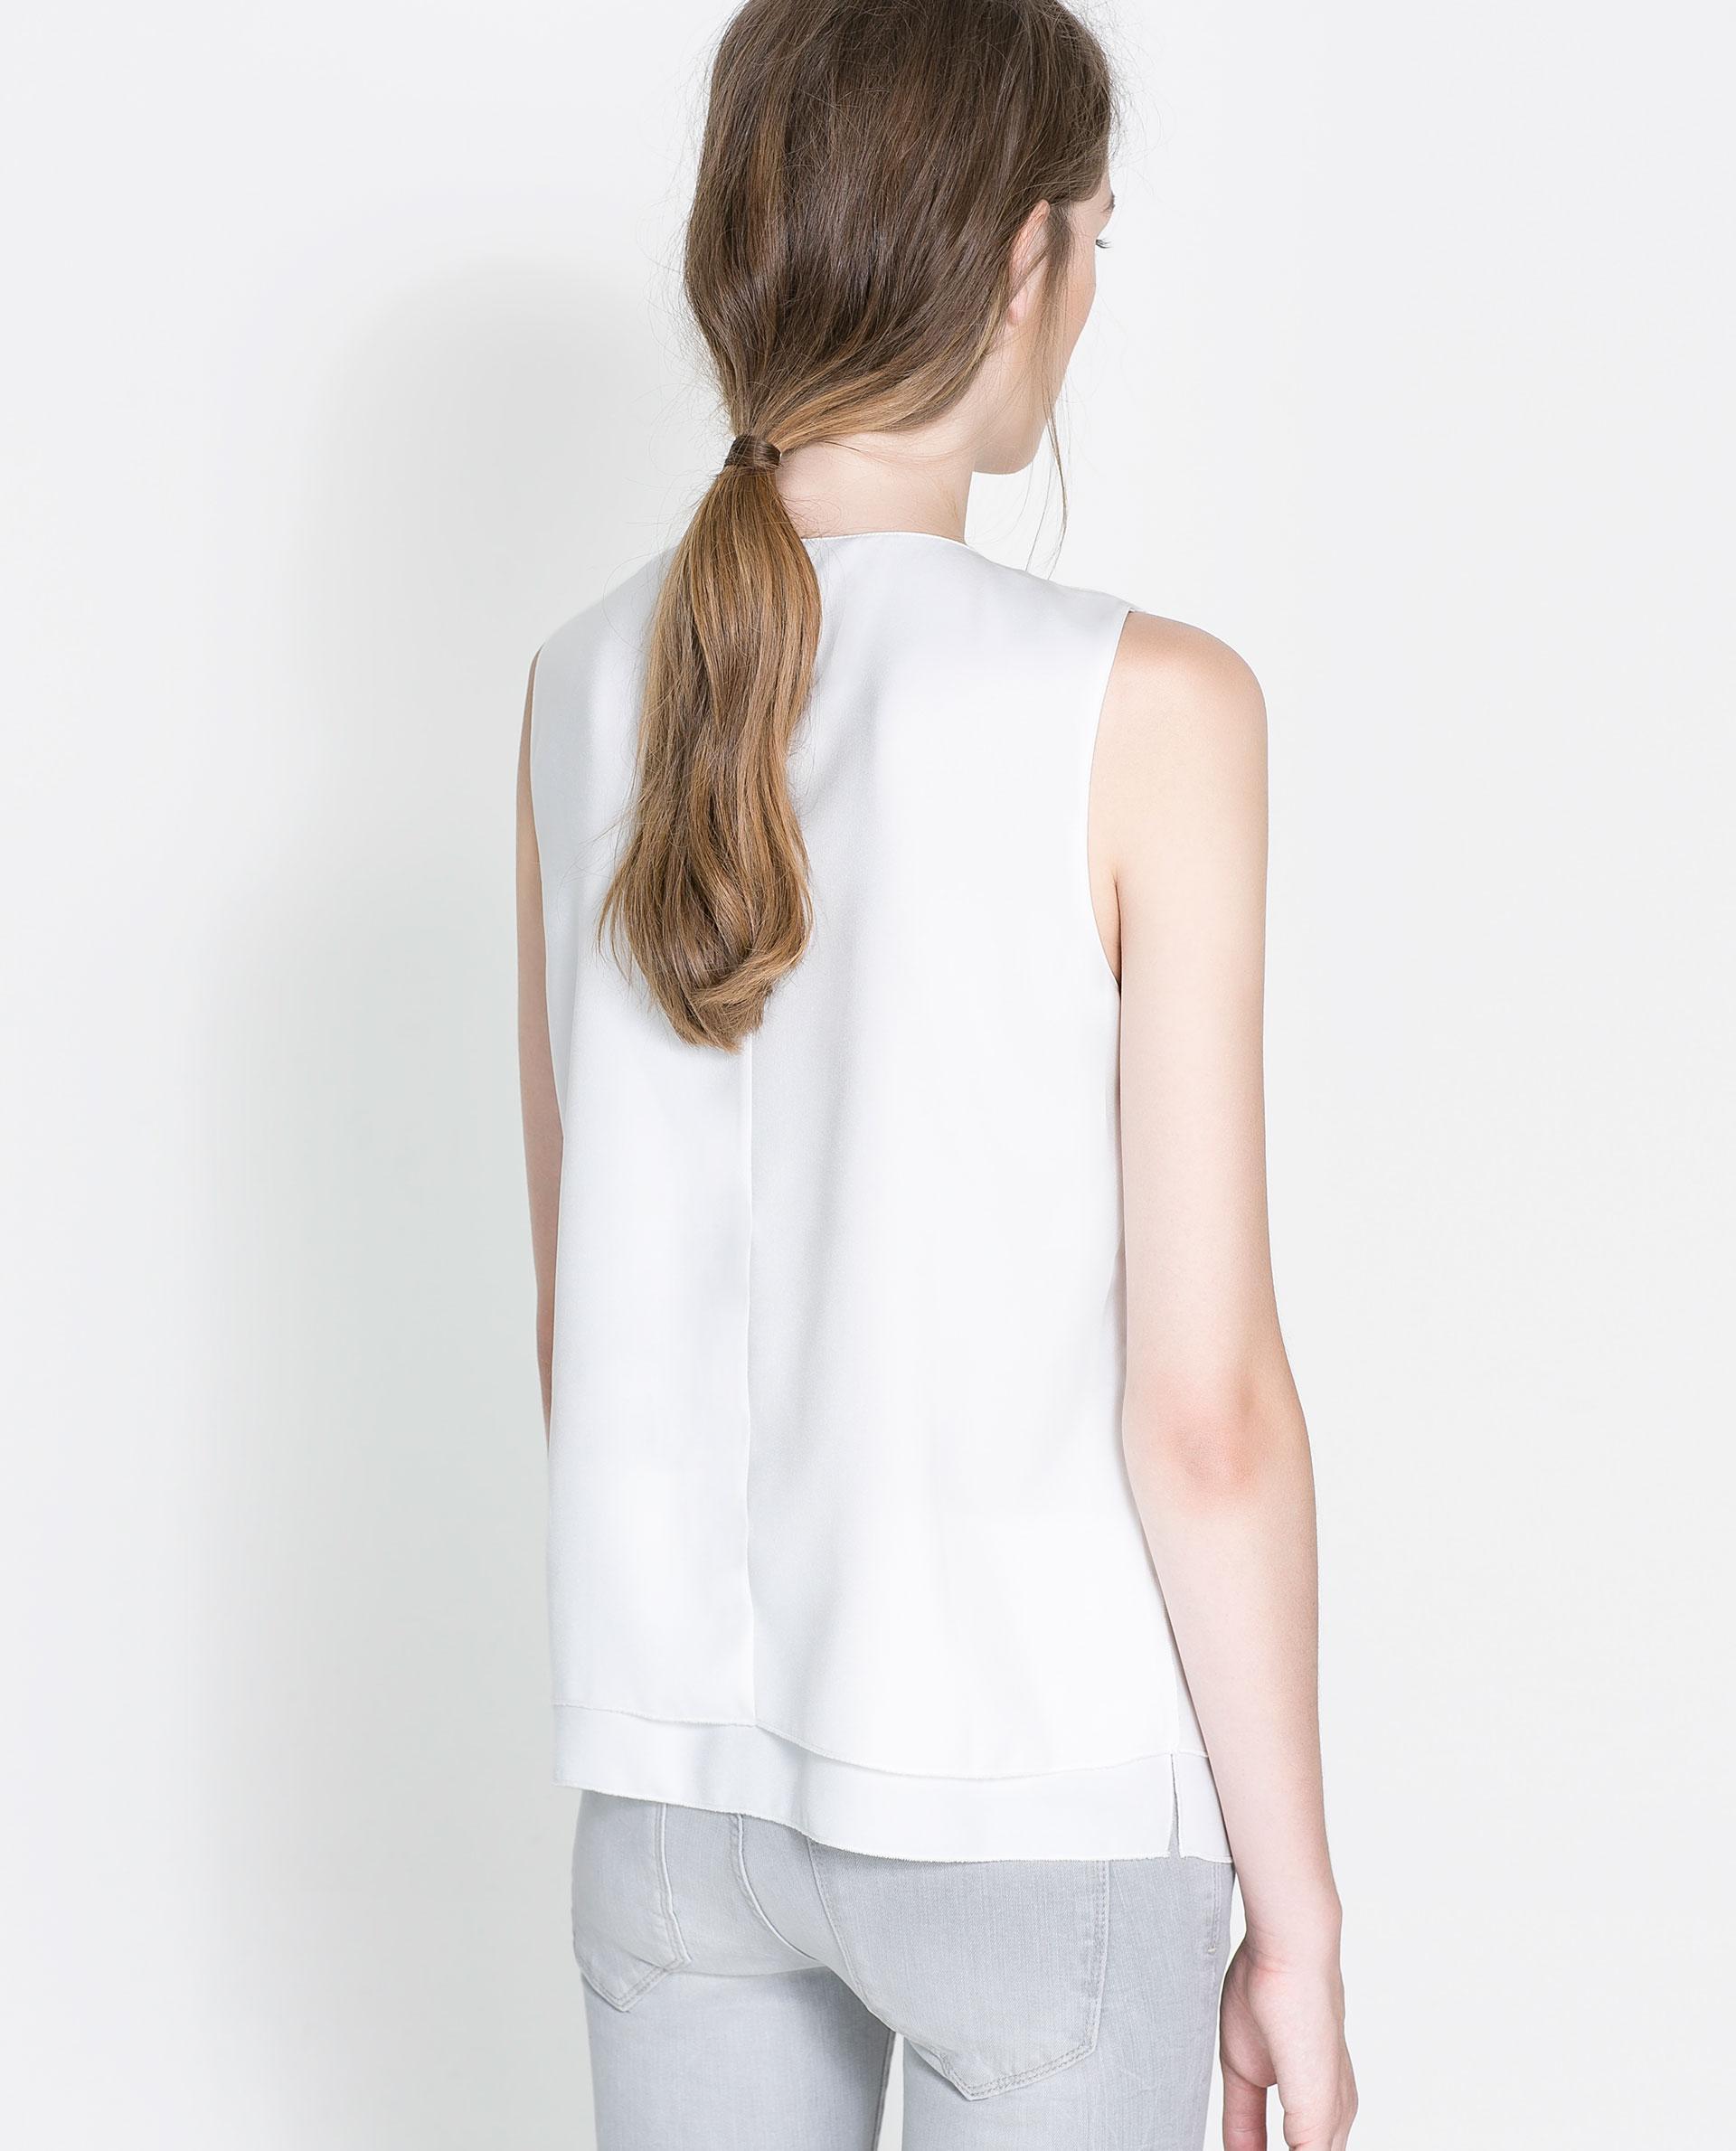 Sleeveless White Blouse Long 95